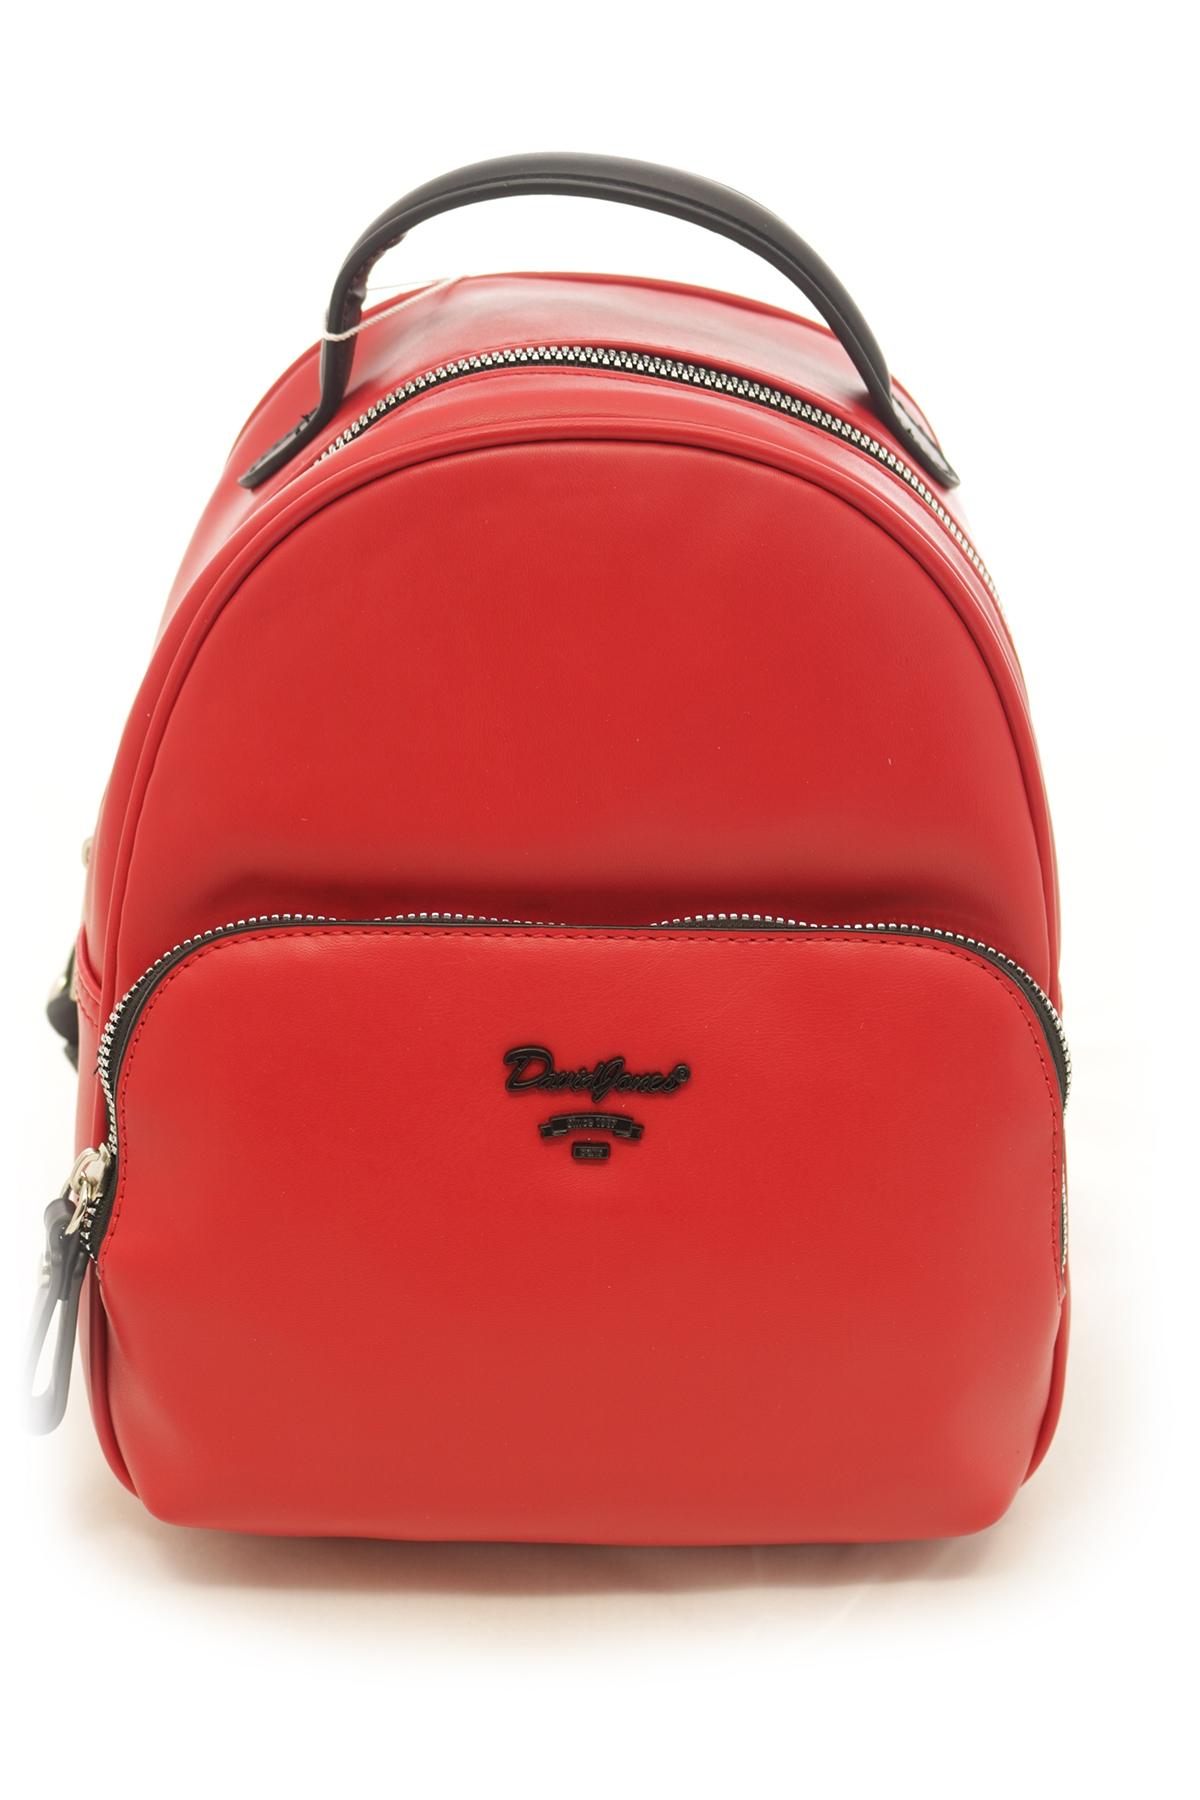 Рюкзак David Jones 6513-3 оптом